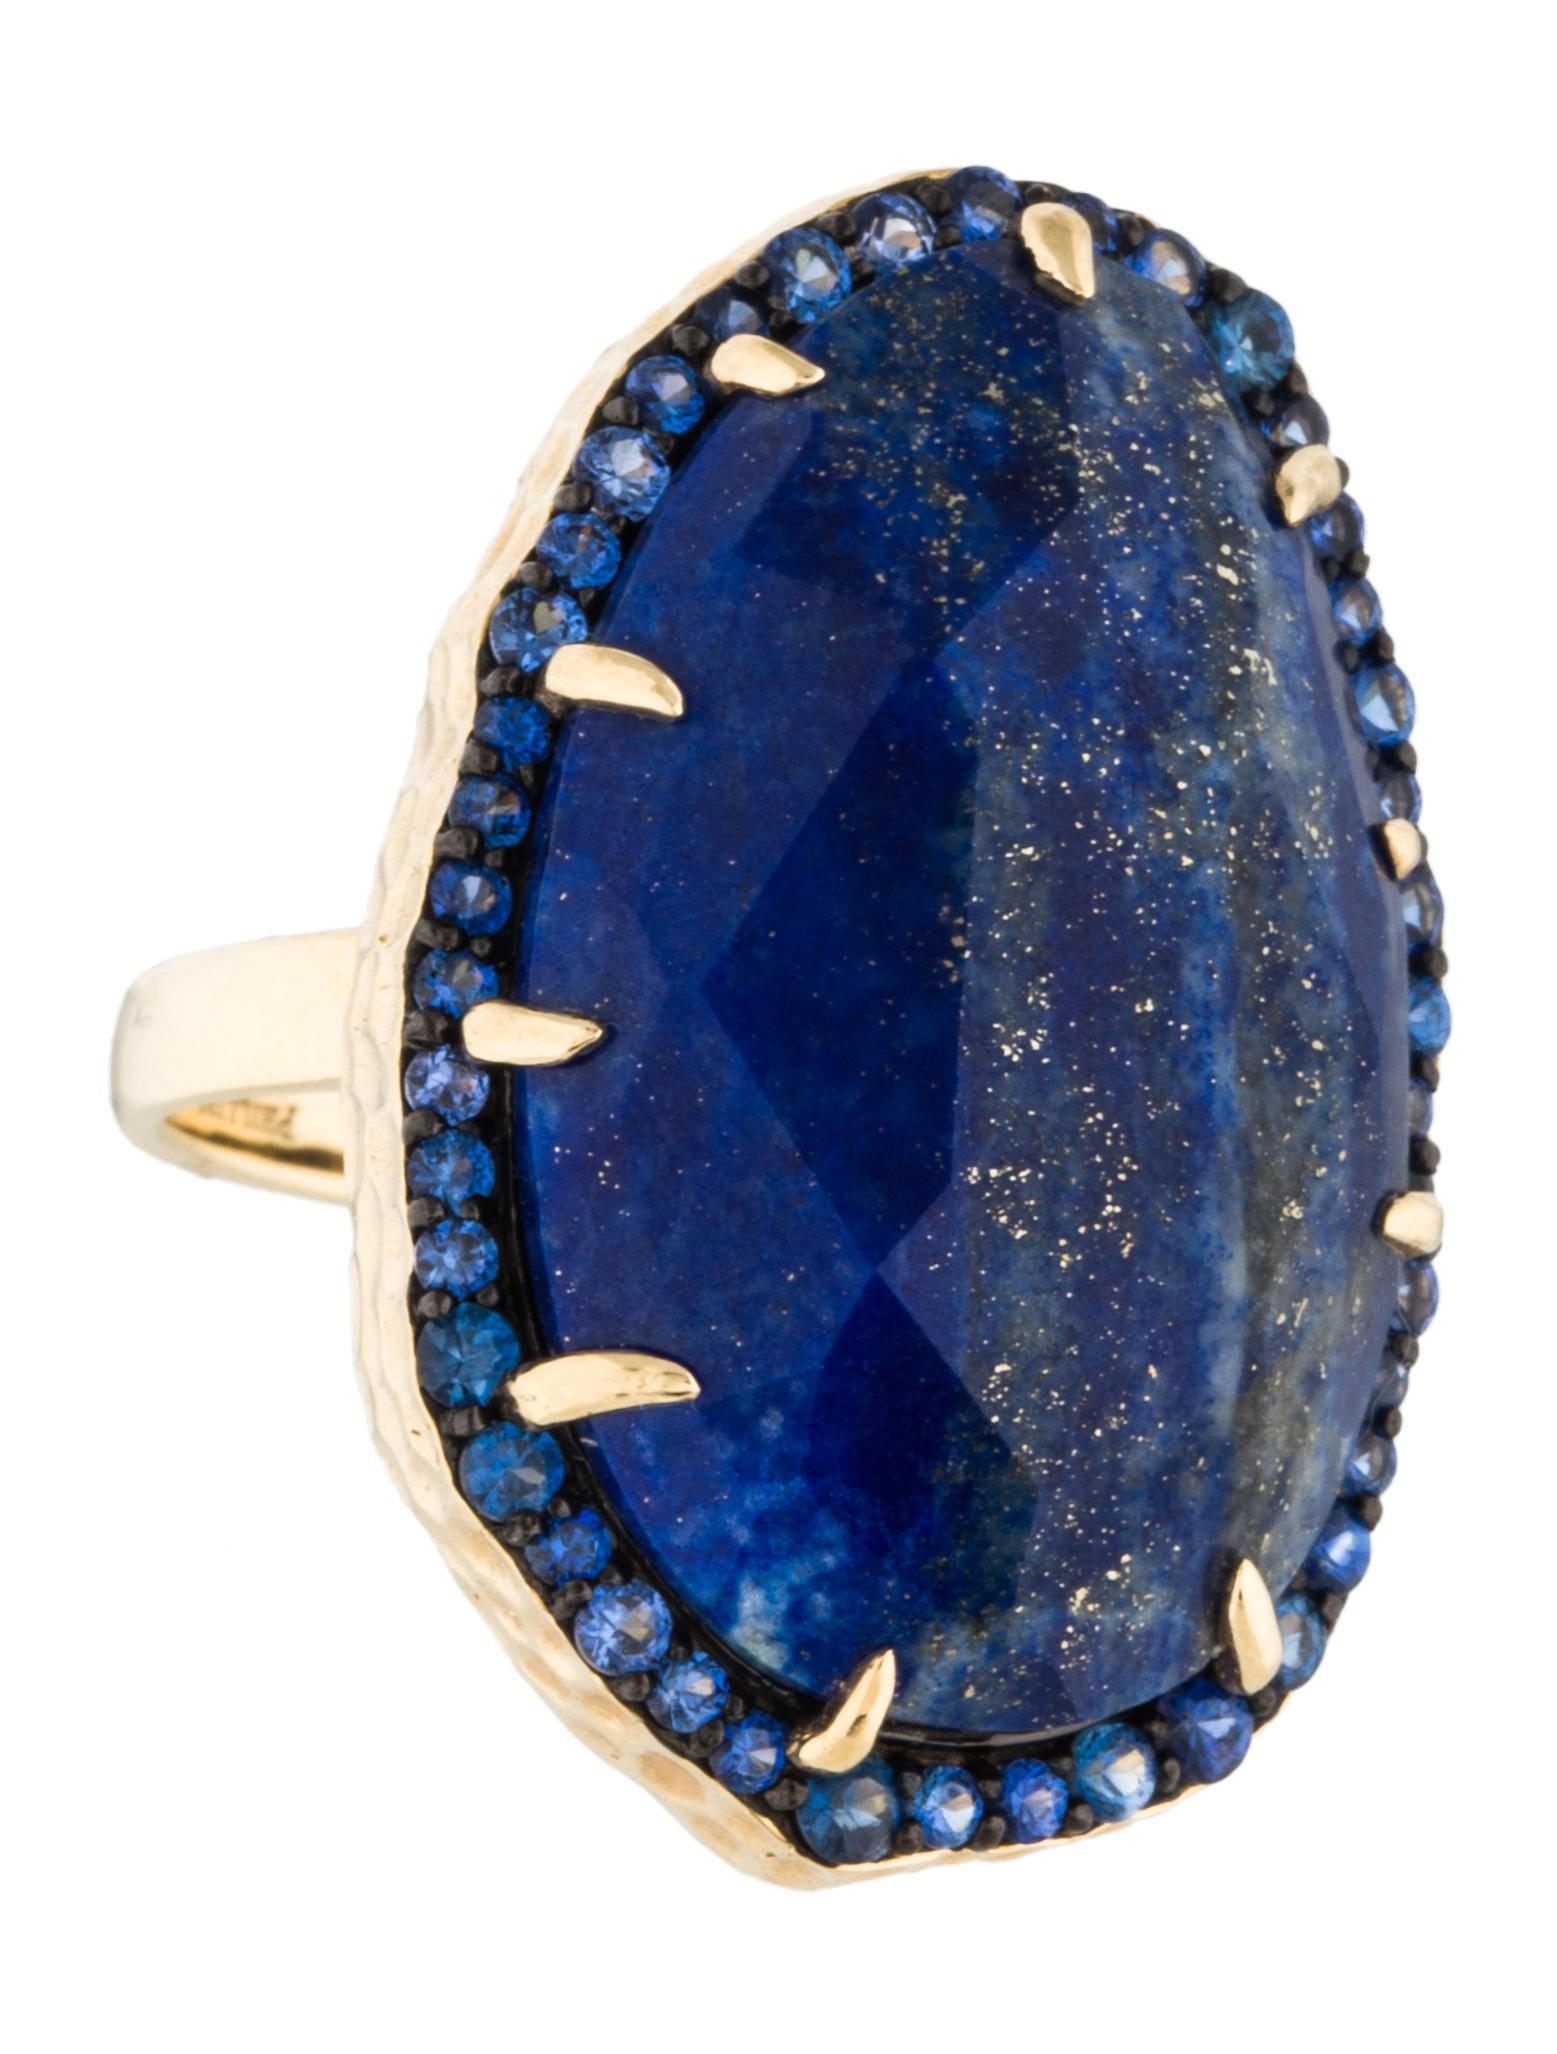 Lapis lazuli house - 14k Lapis Lazuli Sapphire Cocktail Ring